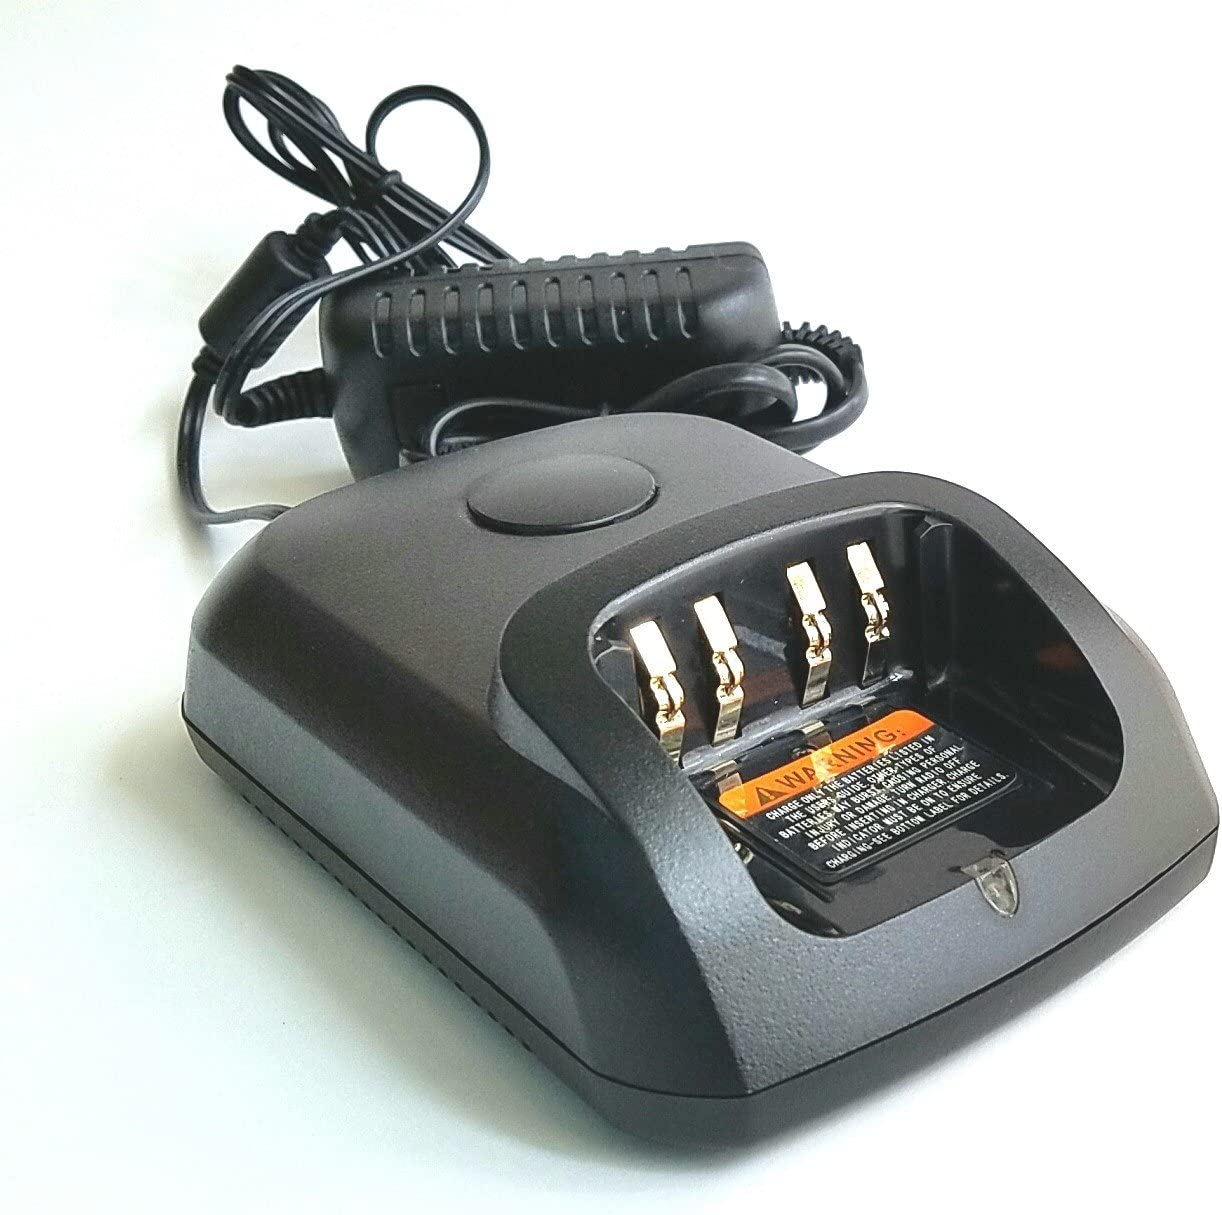 Rapid Charger for Motorola DGP4150 XPR6100 XPR6500 XPR6300 DGP6150 Li-lonBattery